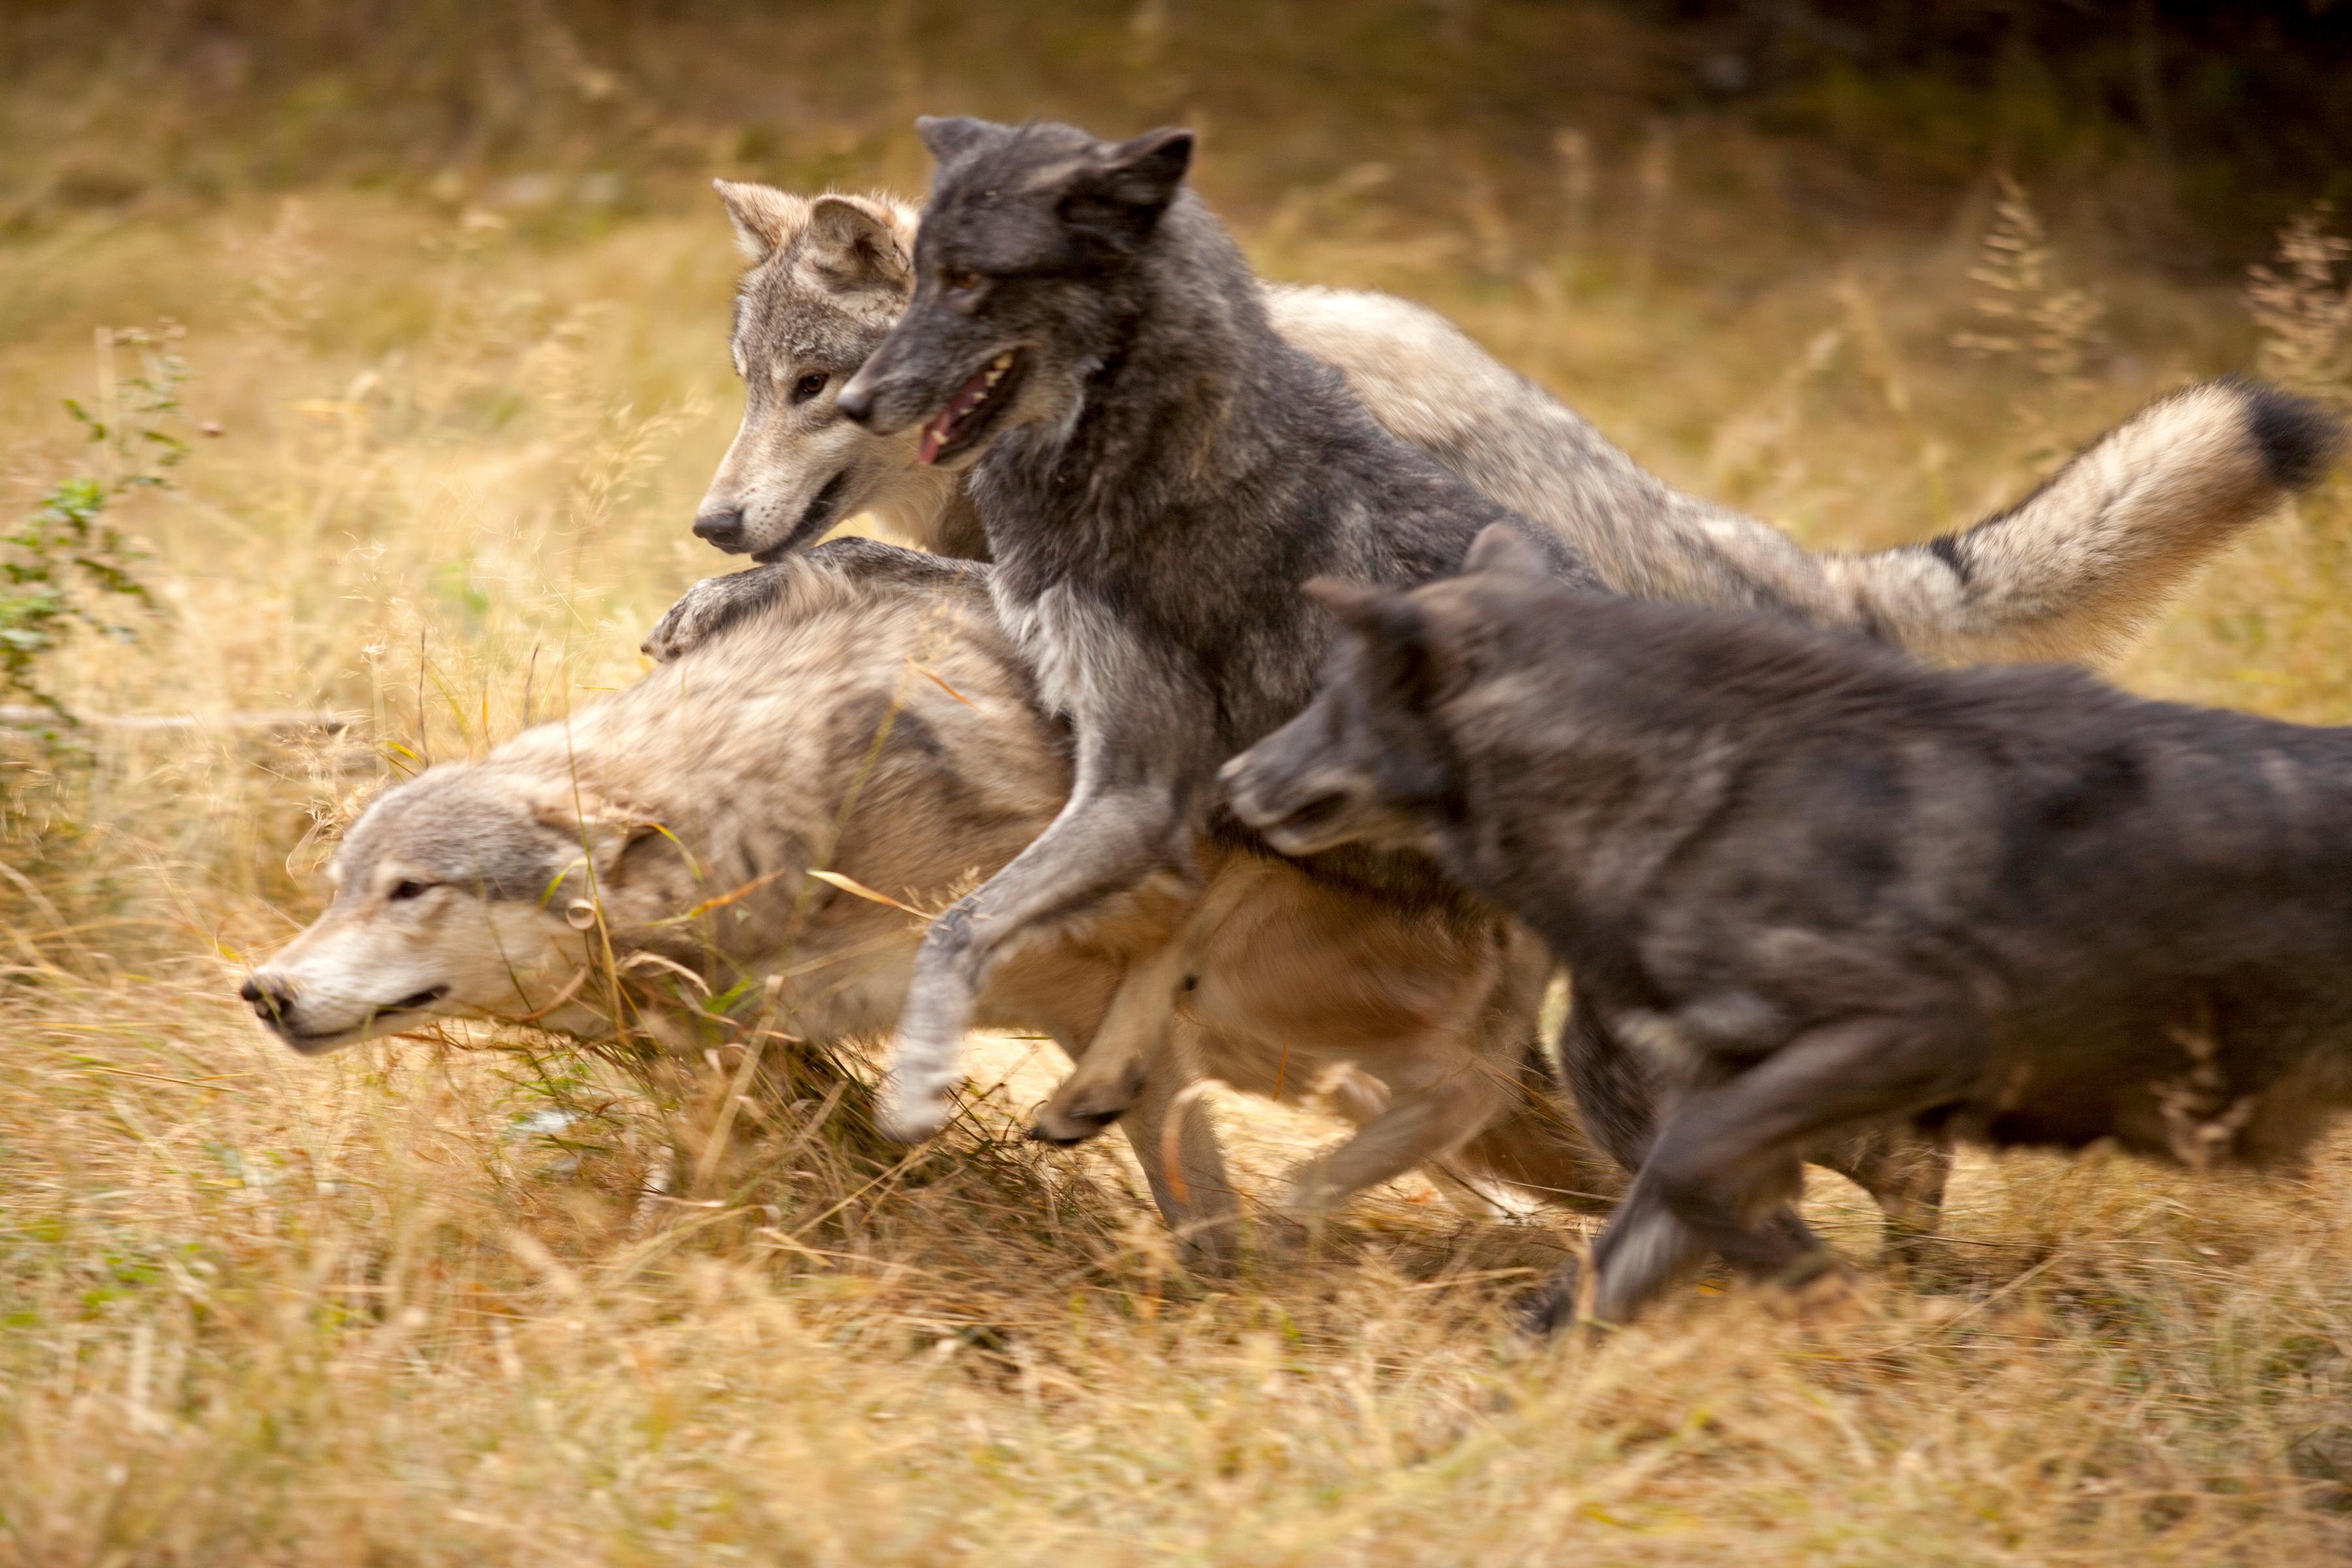 jeffmcgraw-photocase-greywolfpackatplay